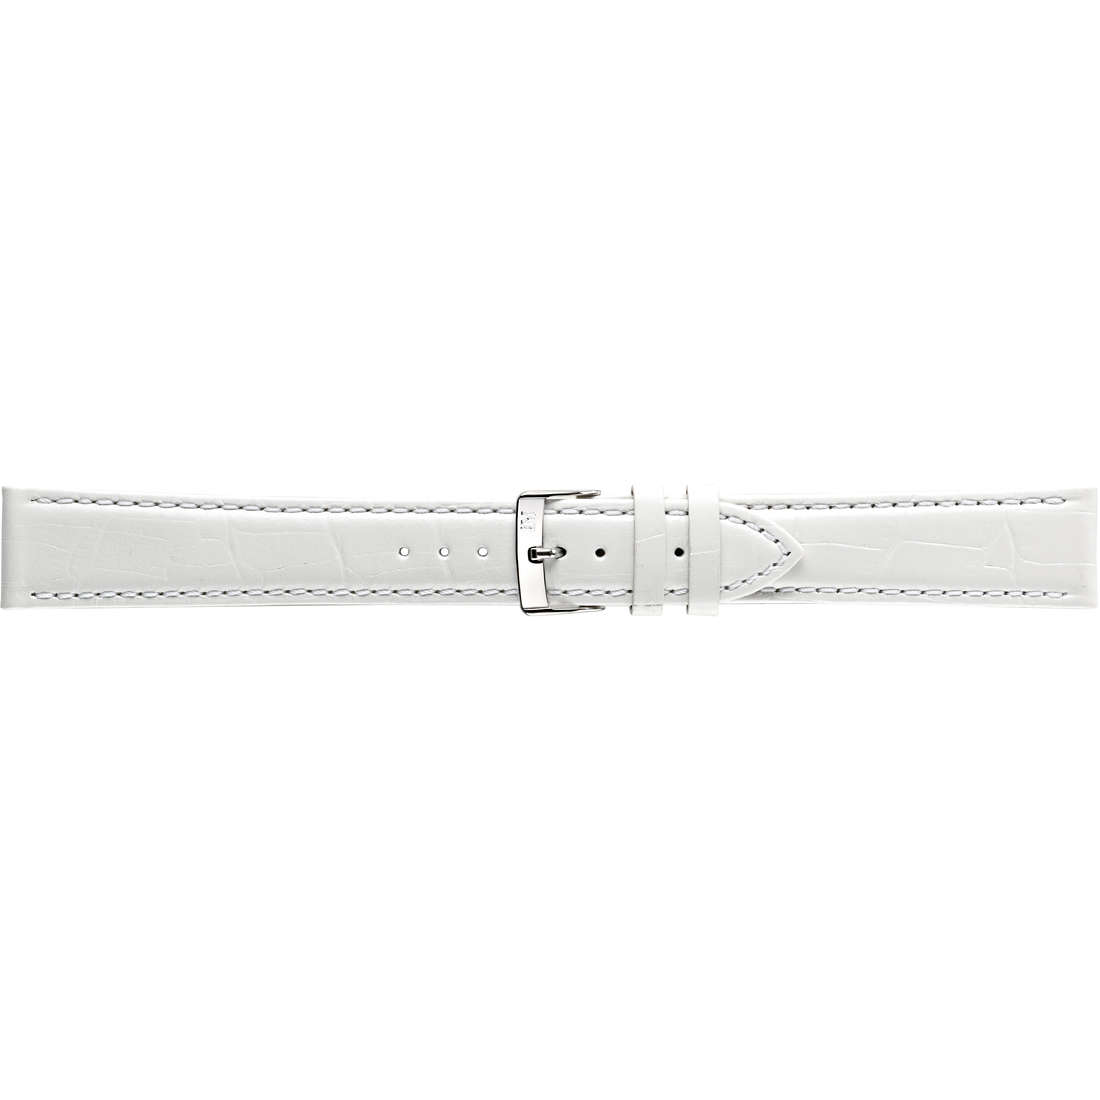 montre bande de montres unisex Morellato I Lunghi A01Y2269480017CR20